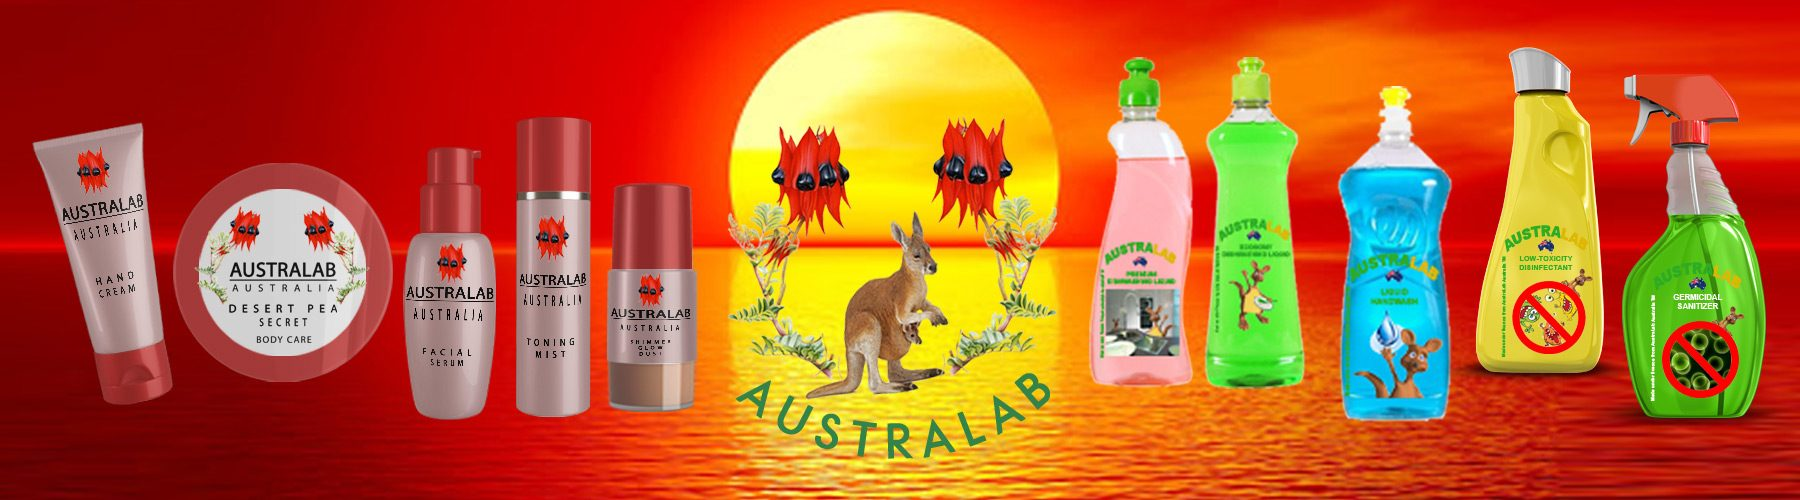 australab-cosmetics-detergent